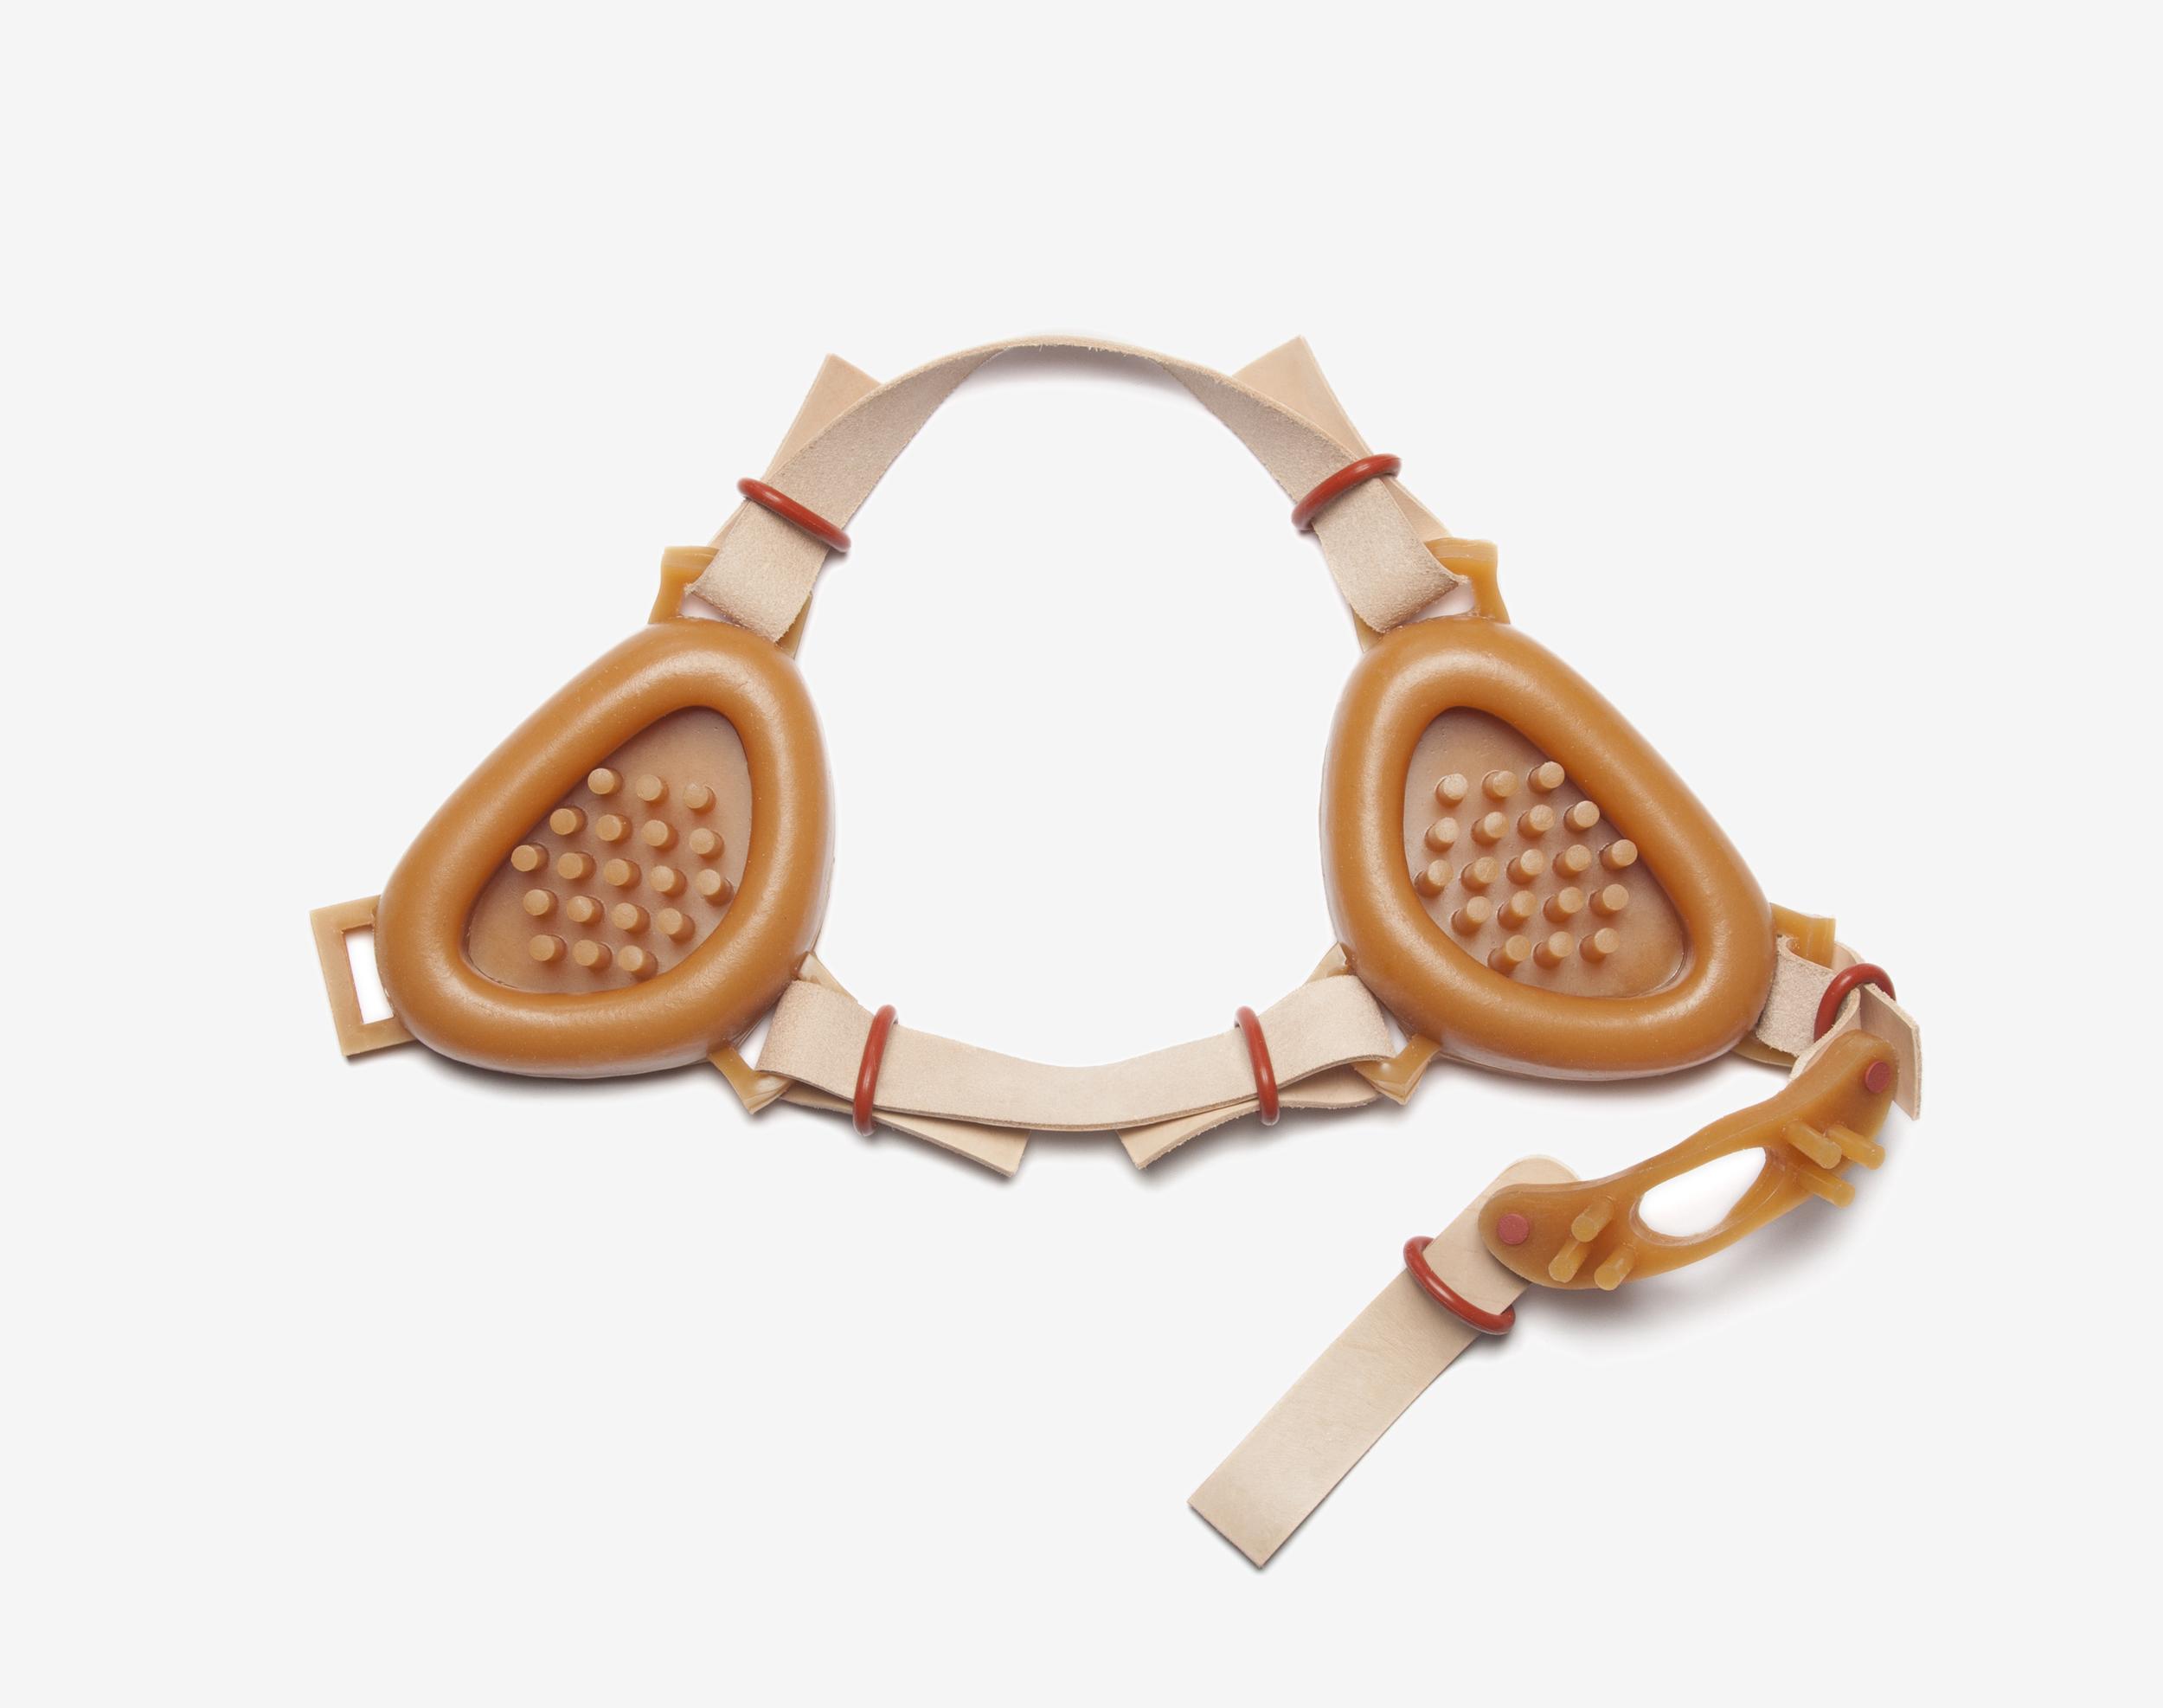 "Knismesis Headgear, 2014, urethane, rigid photopolymer, leather, rubber, 6.5"" x 4.25"" x 1"" (single piece)"